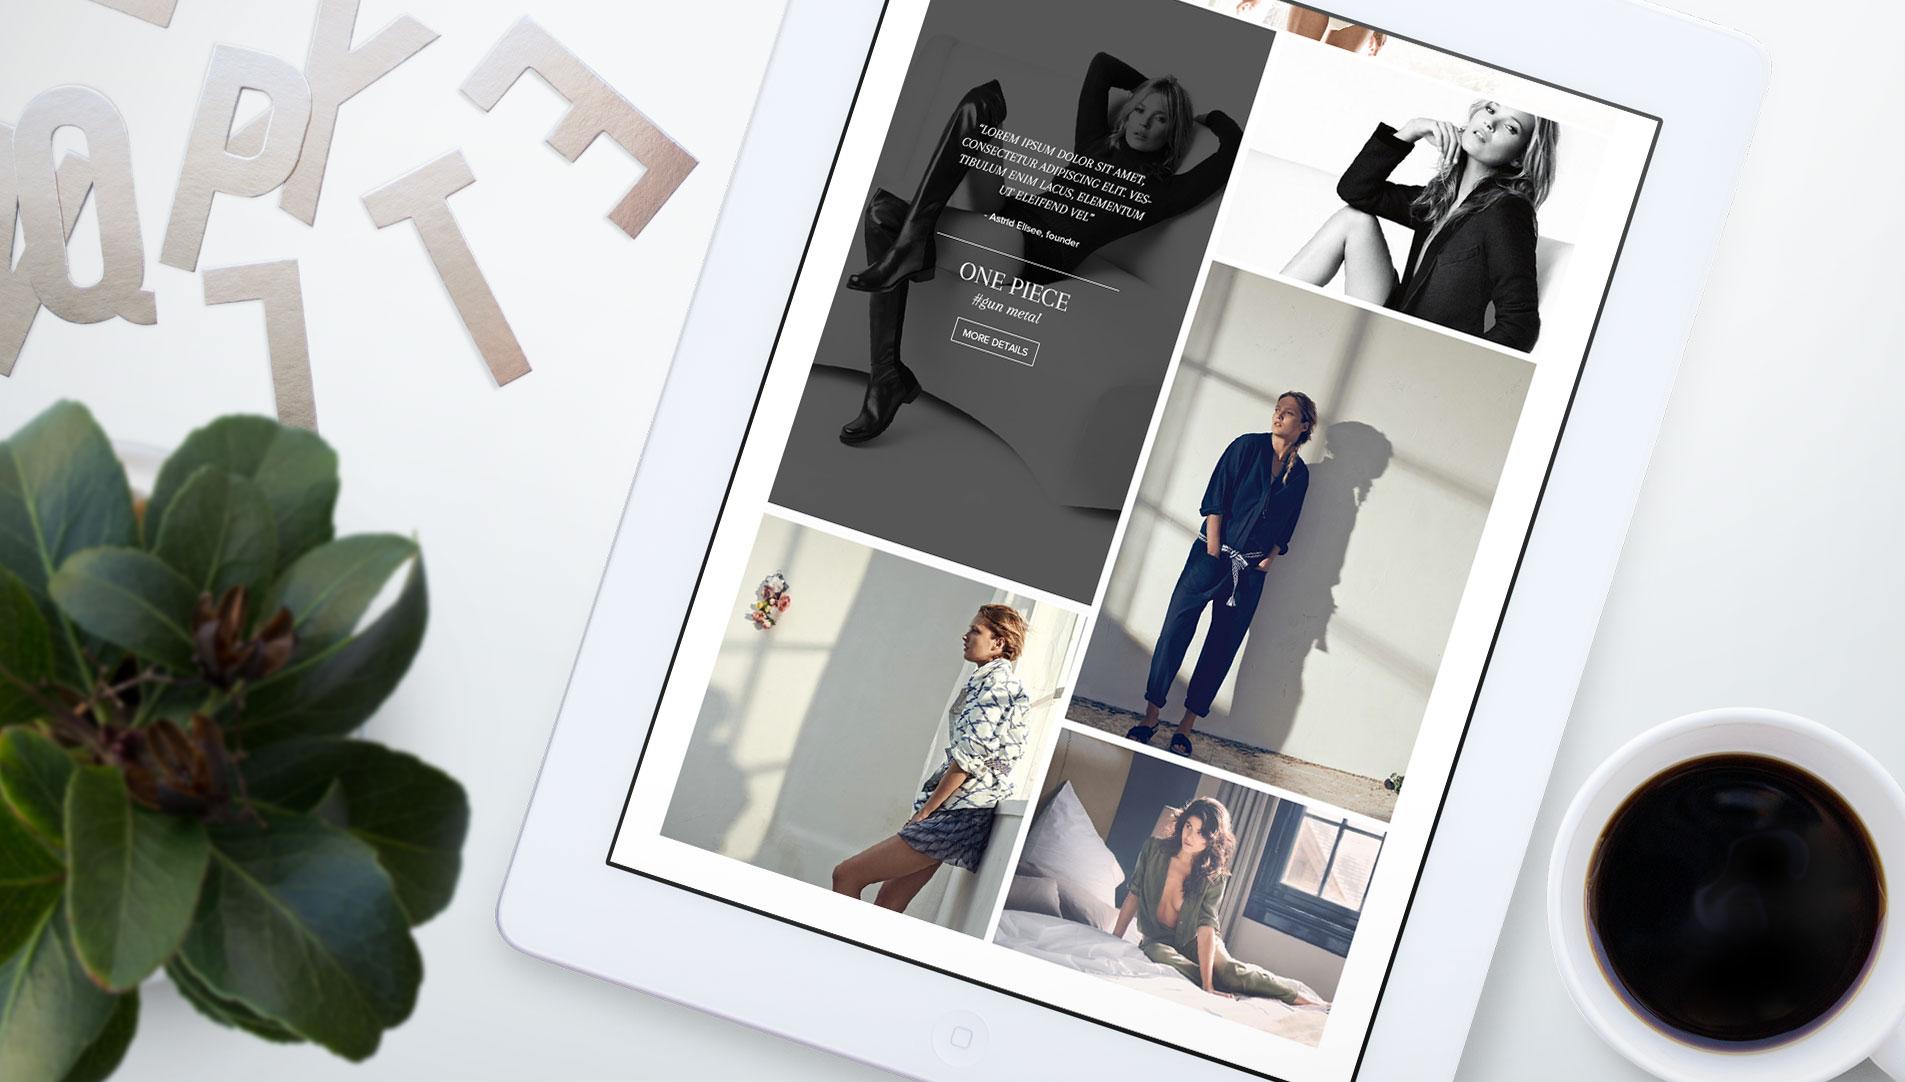 e-commerce hk astrid elisee slideshow 01